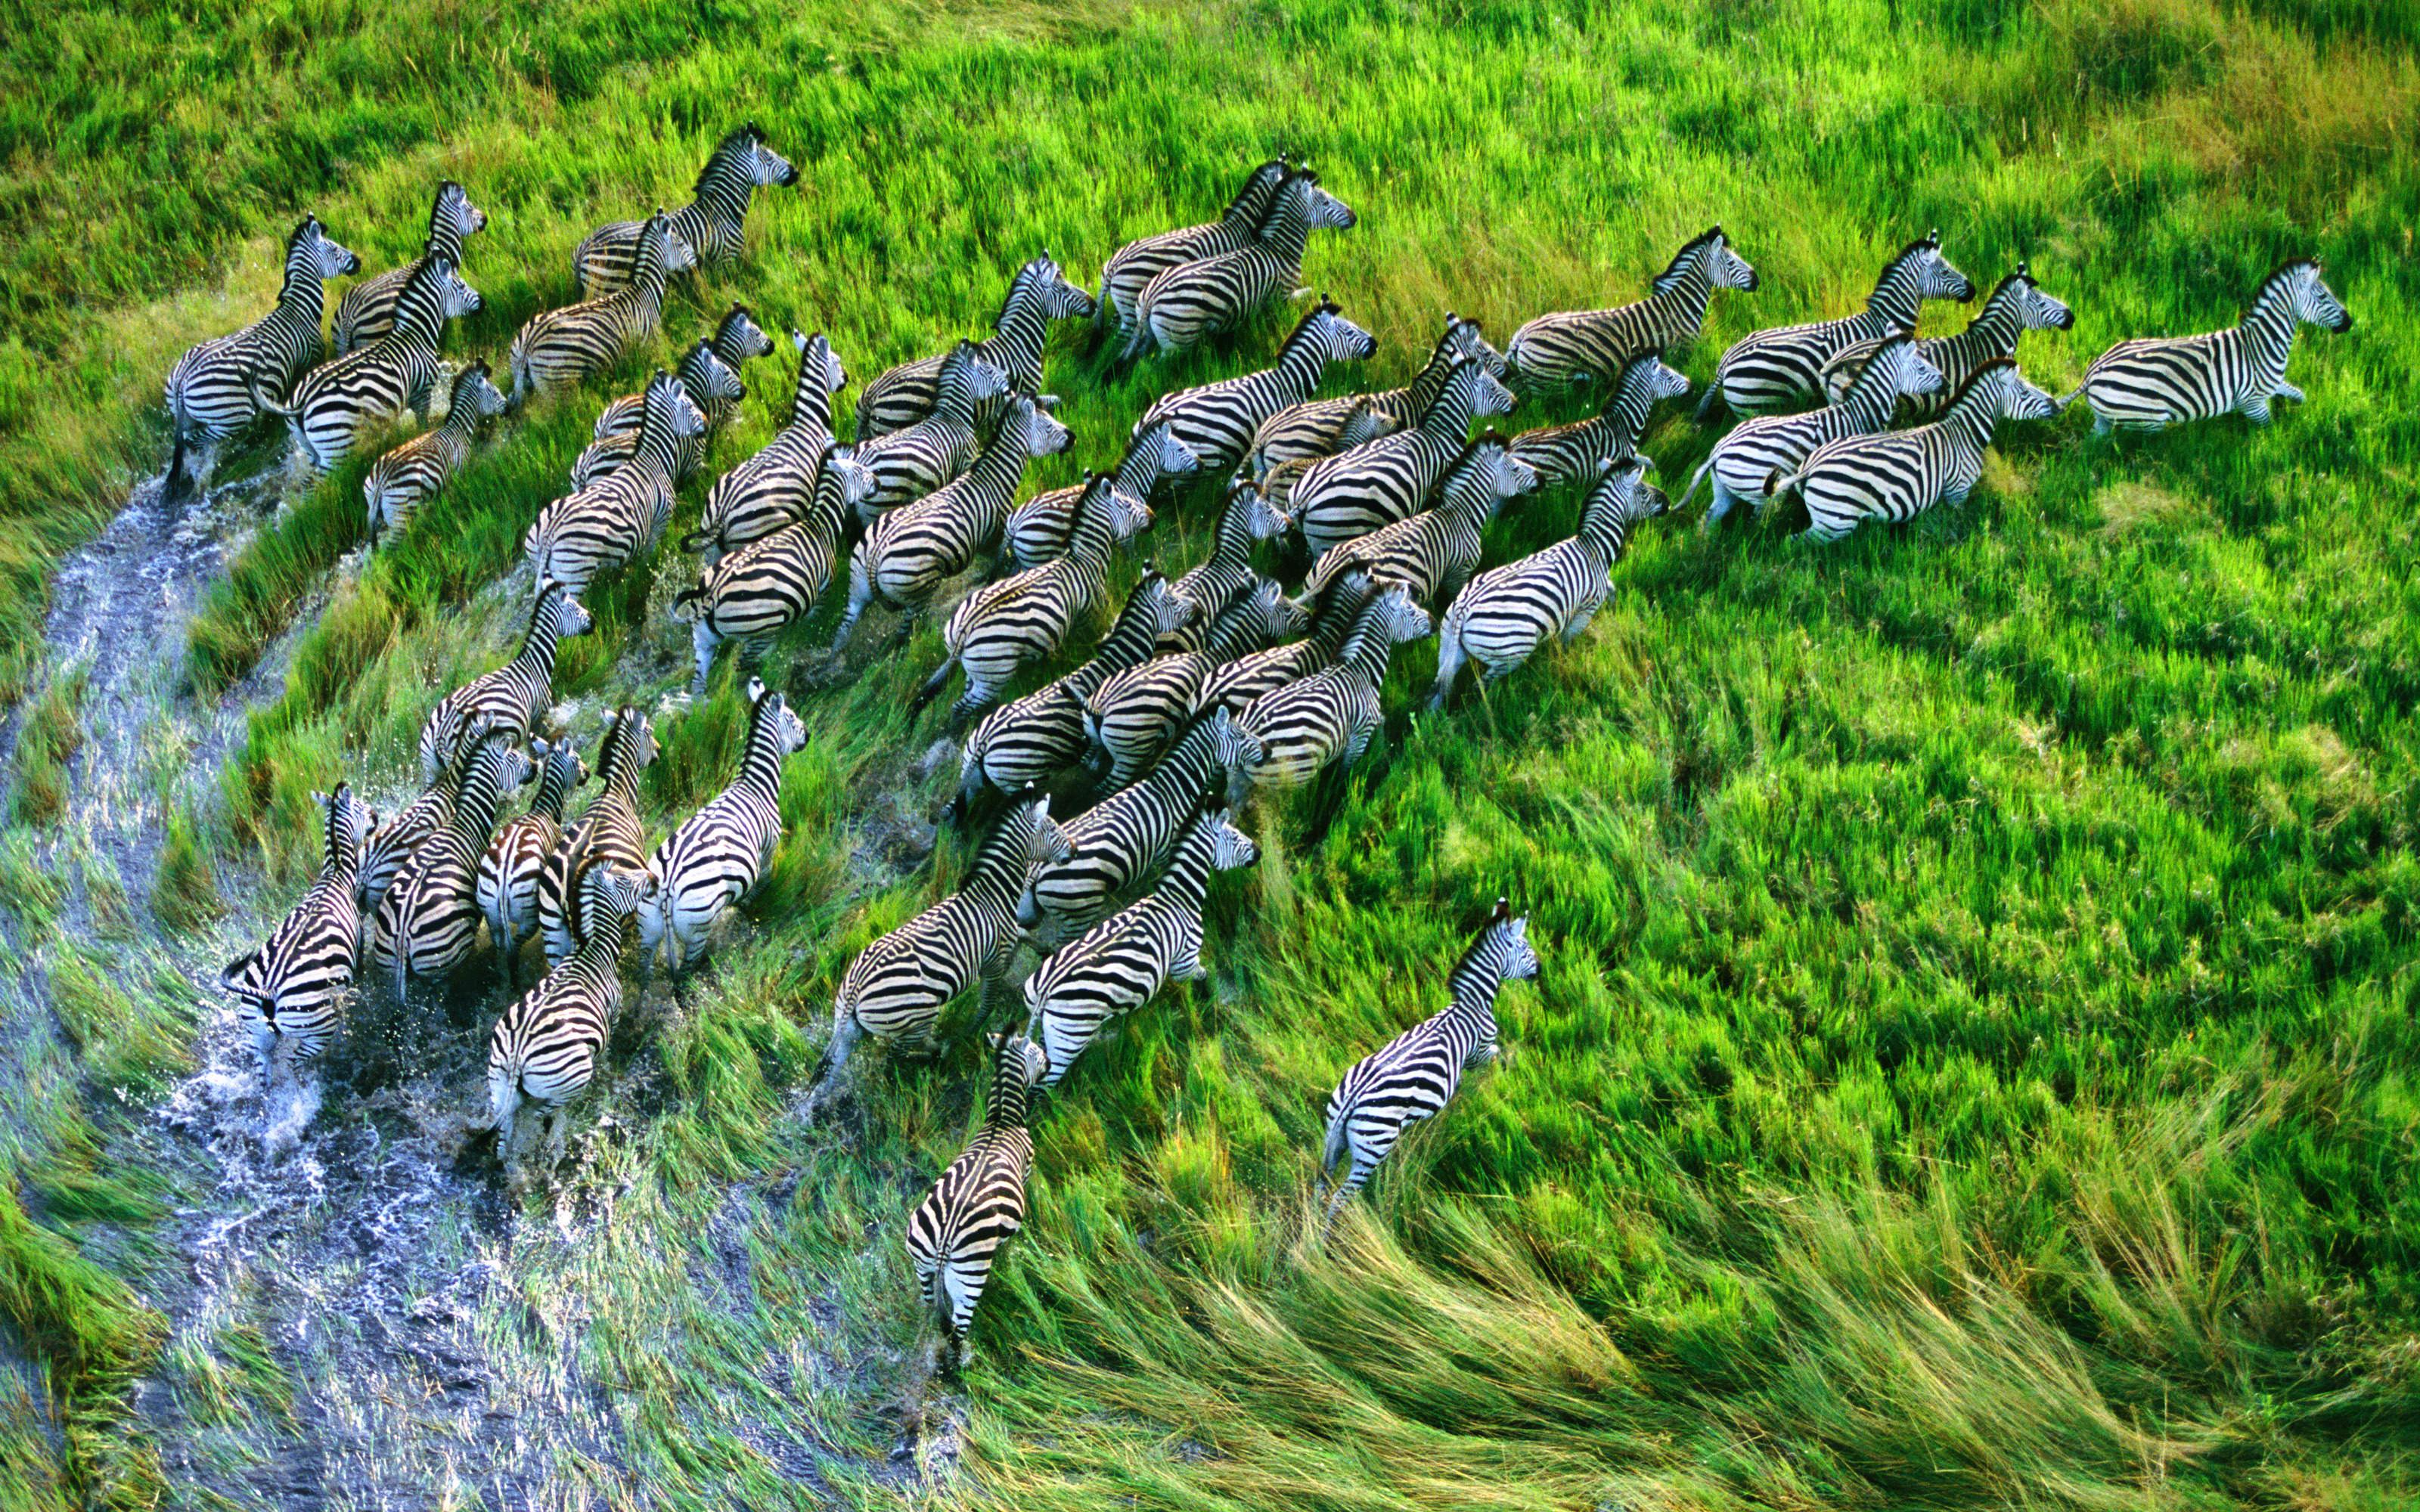 10 Beautiful Mac OS HD Wallpaper and MacBook Pro Retina Display Zebra ...